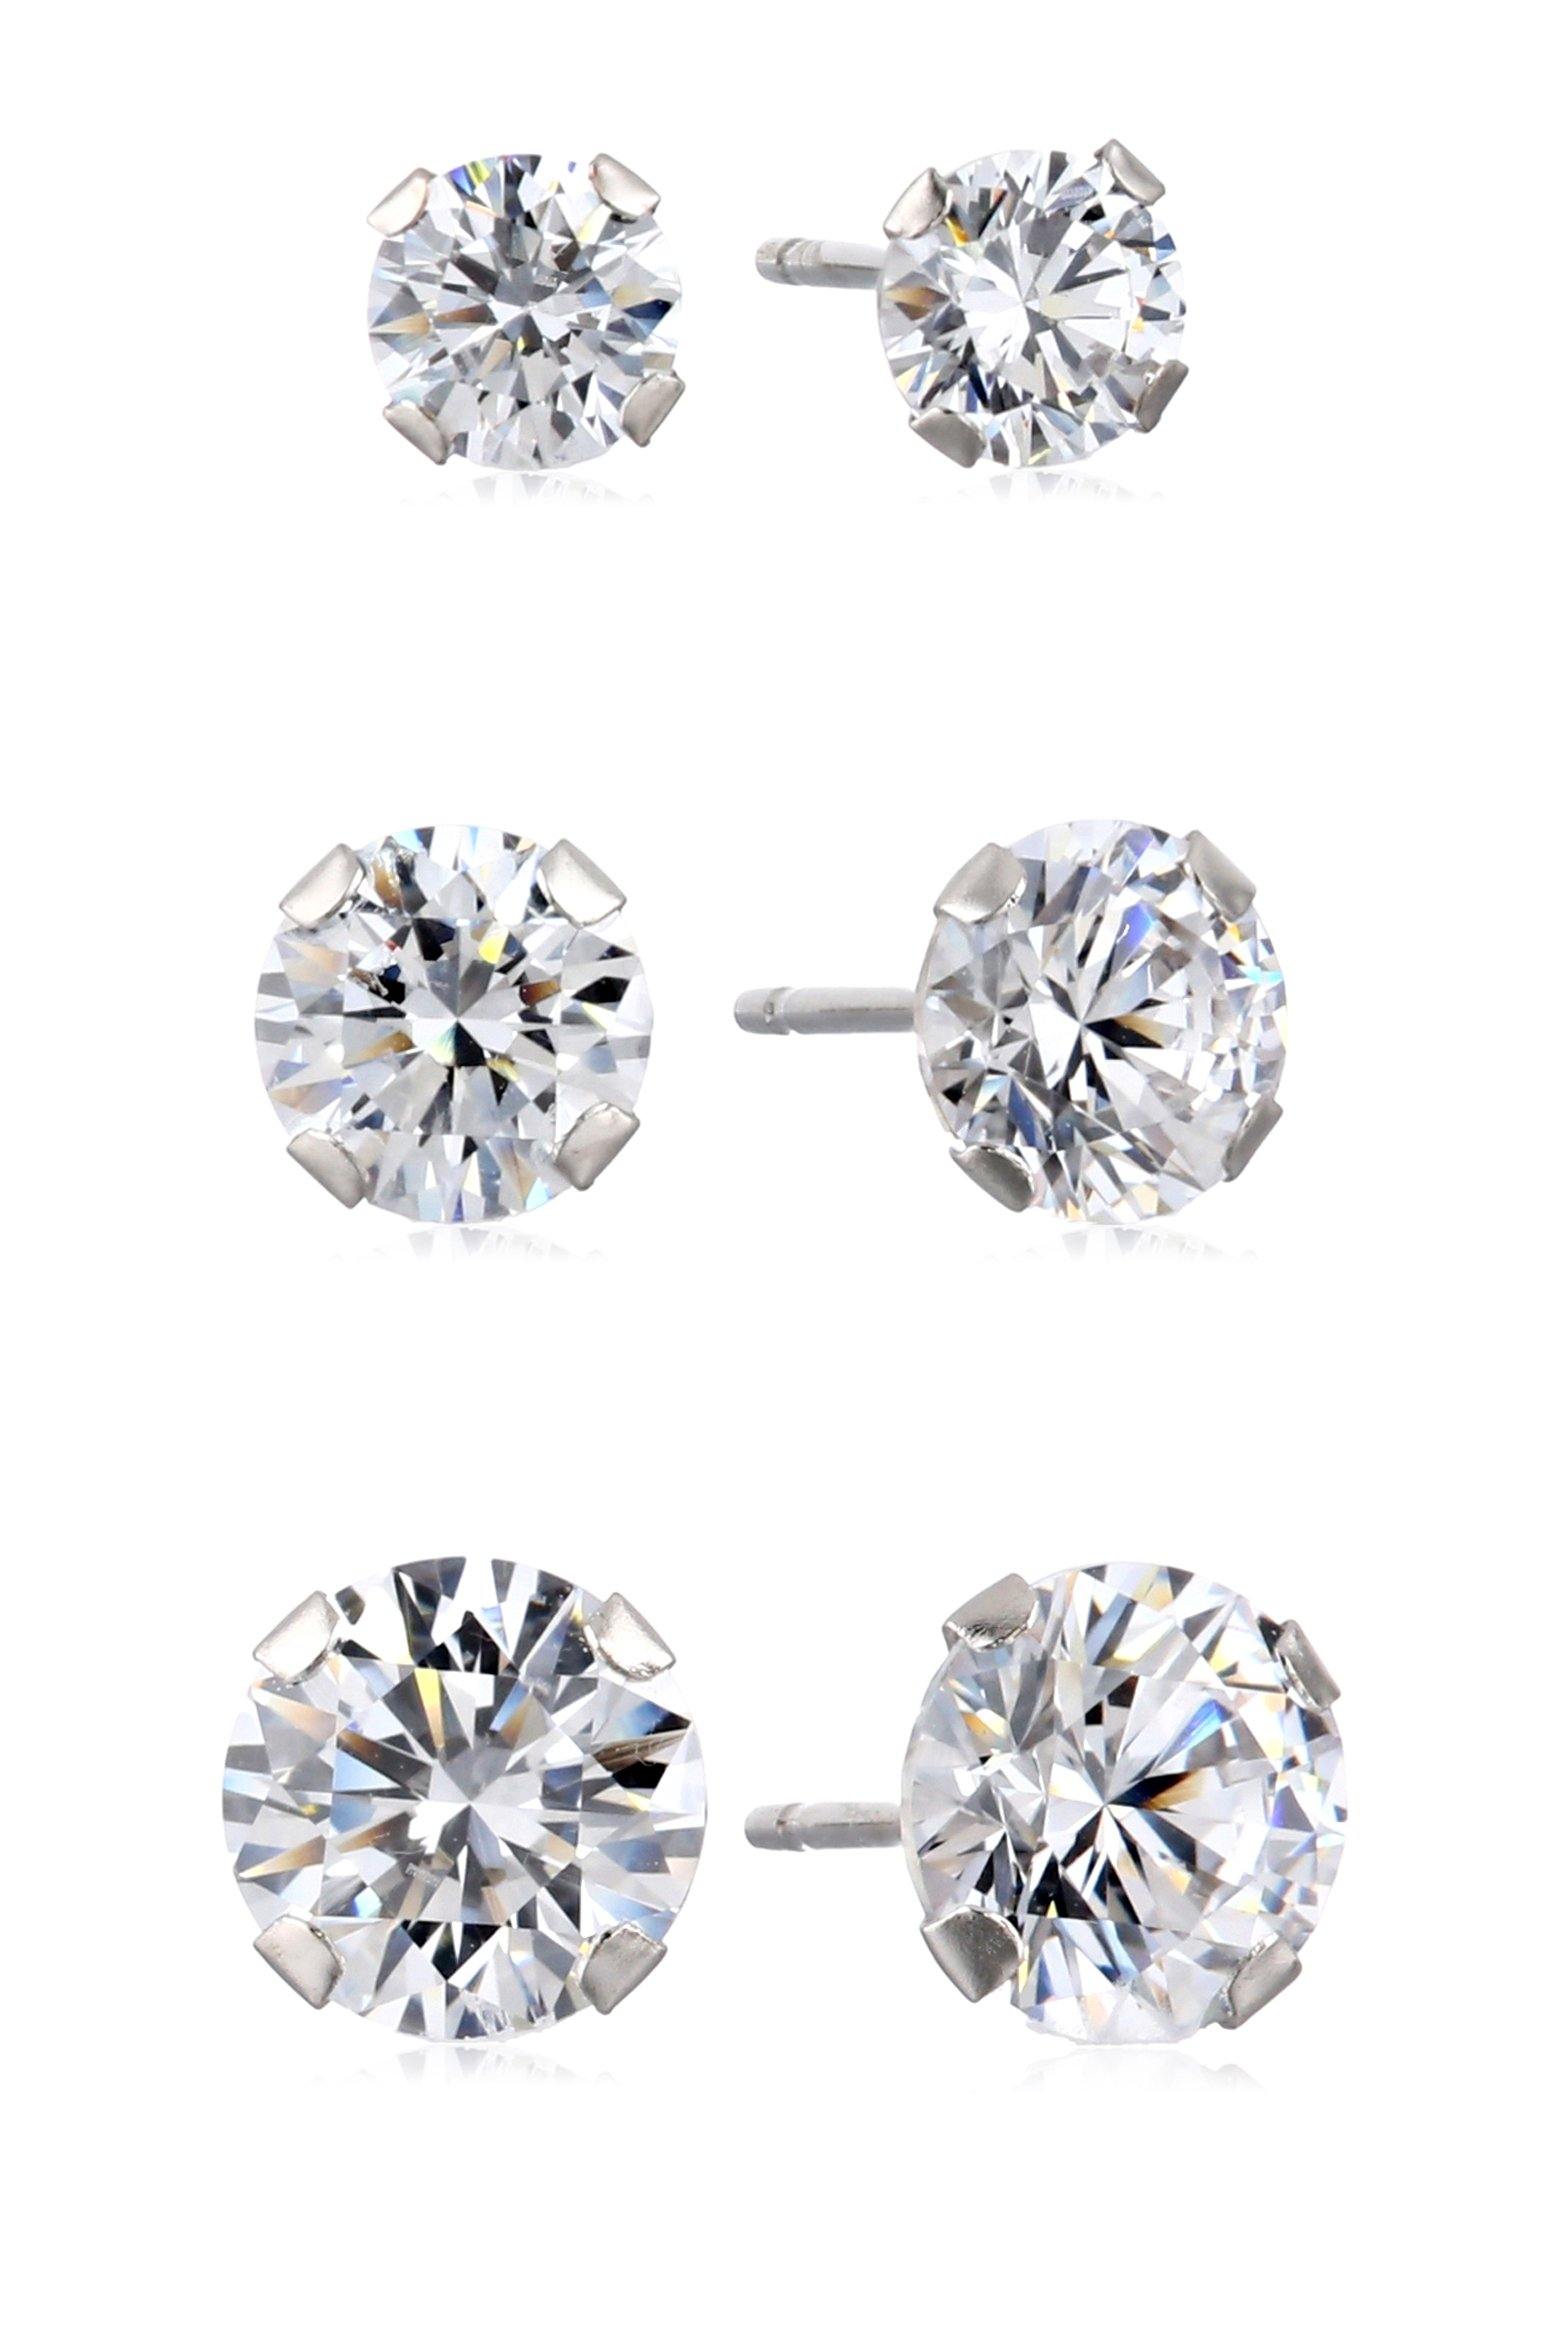 Jewelili 10kt White Gold Three Stud Earrings Set with Round Cut Swarovski Zirconia, 3.5cttw by Jewelili